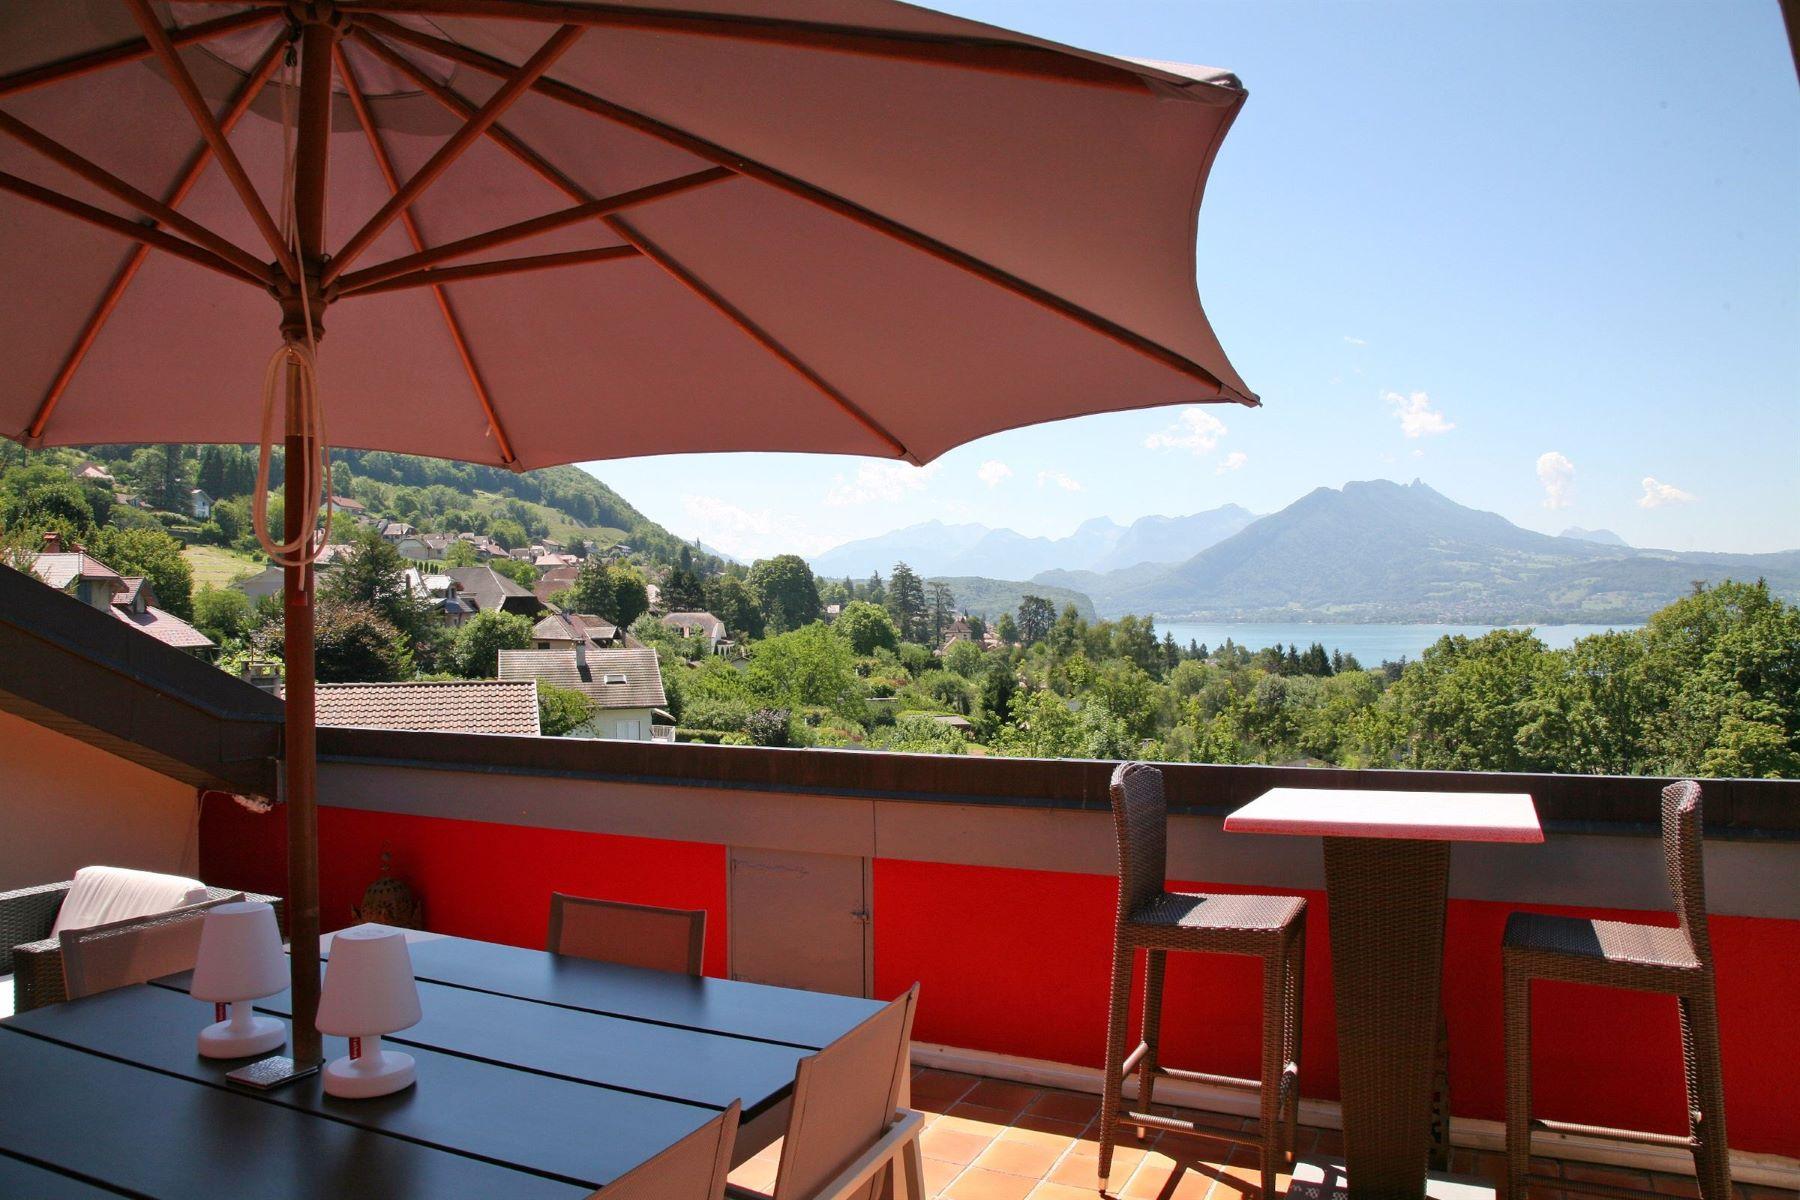 Квартира для того Продажа на Unique apartment with lake view and terraces Veyrier Du Lac, Rhone-Alpes, 74290 Франция